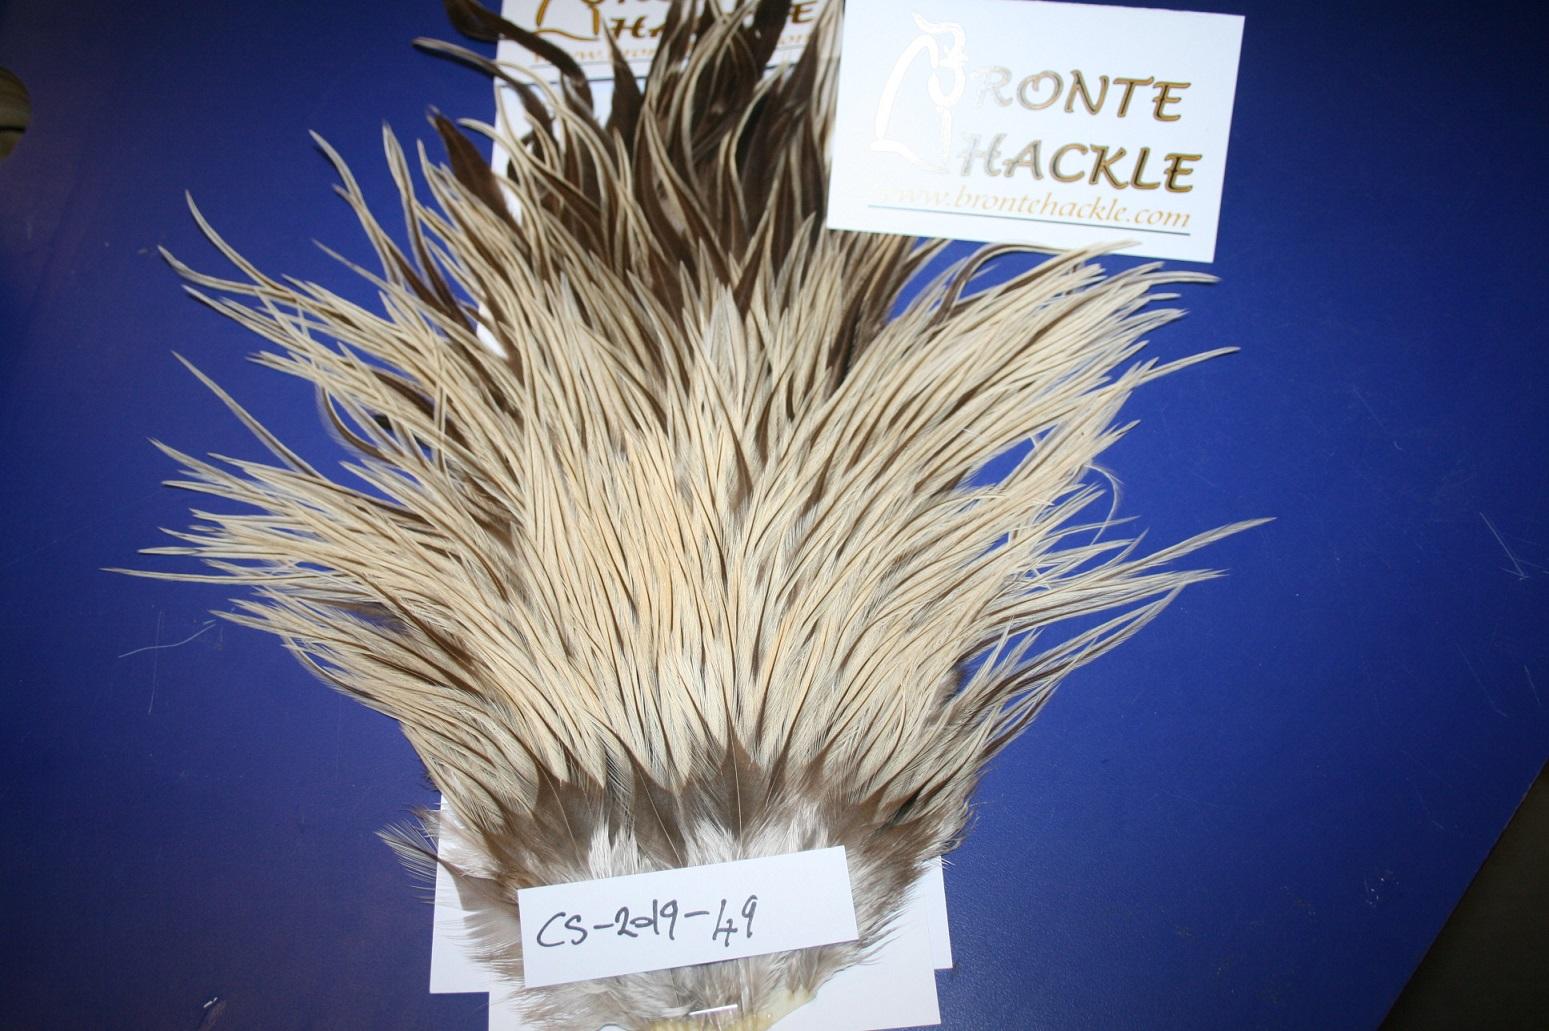 Bronte Hackle Cock Saddles               cs-2019-49